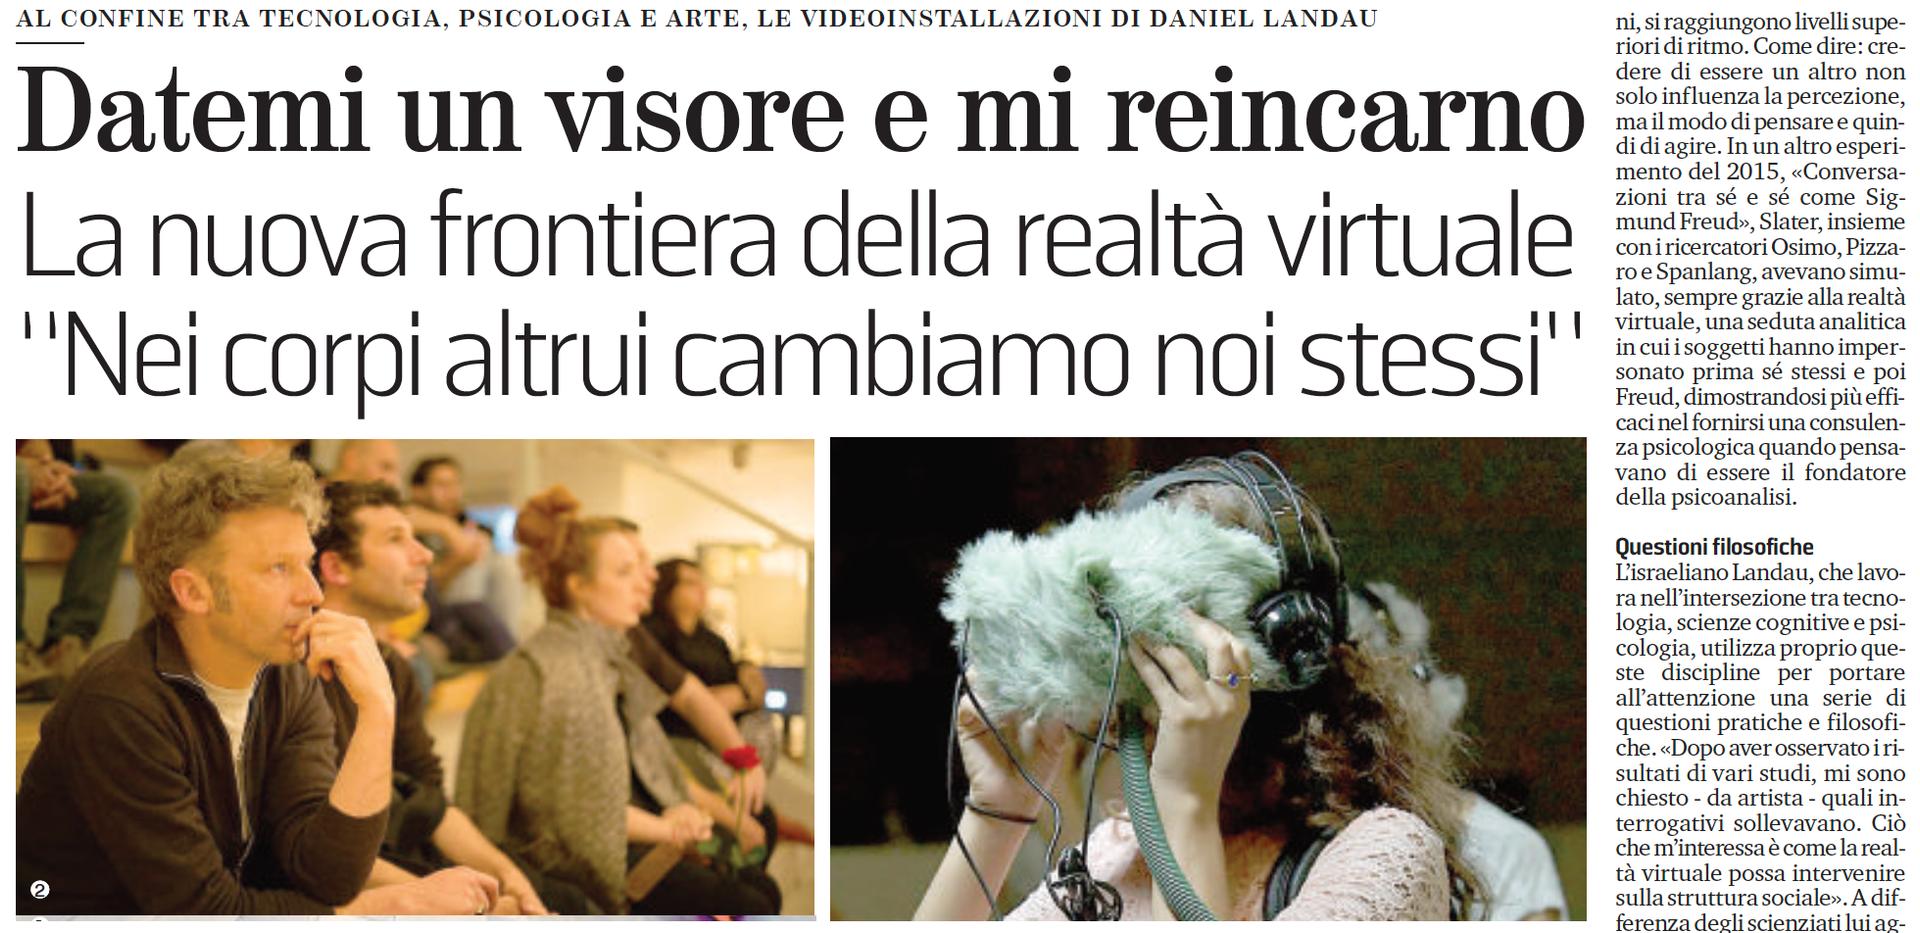 La Stampa - August 4, 2018